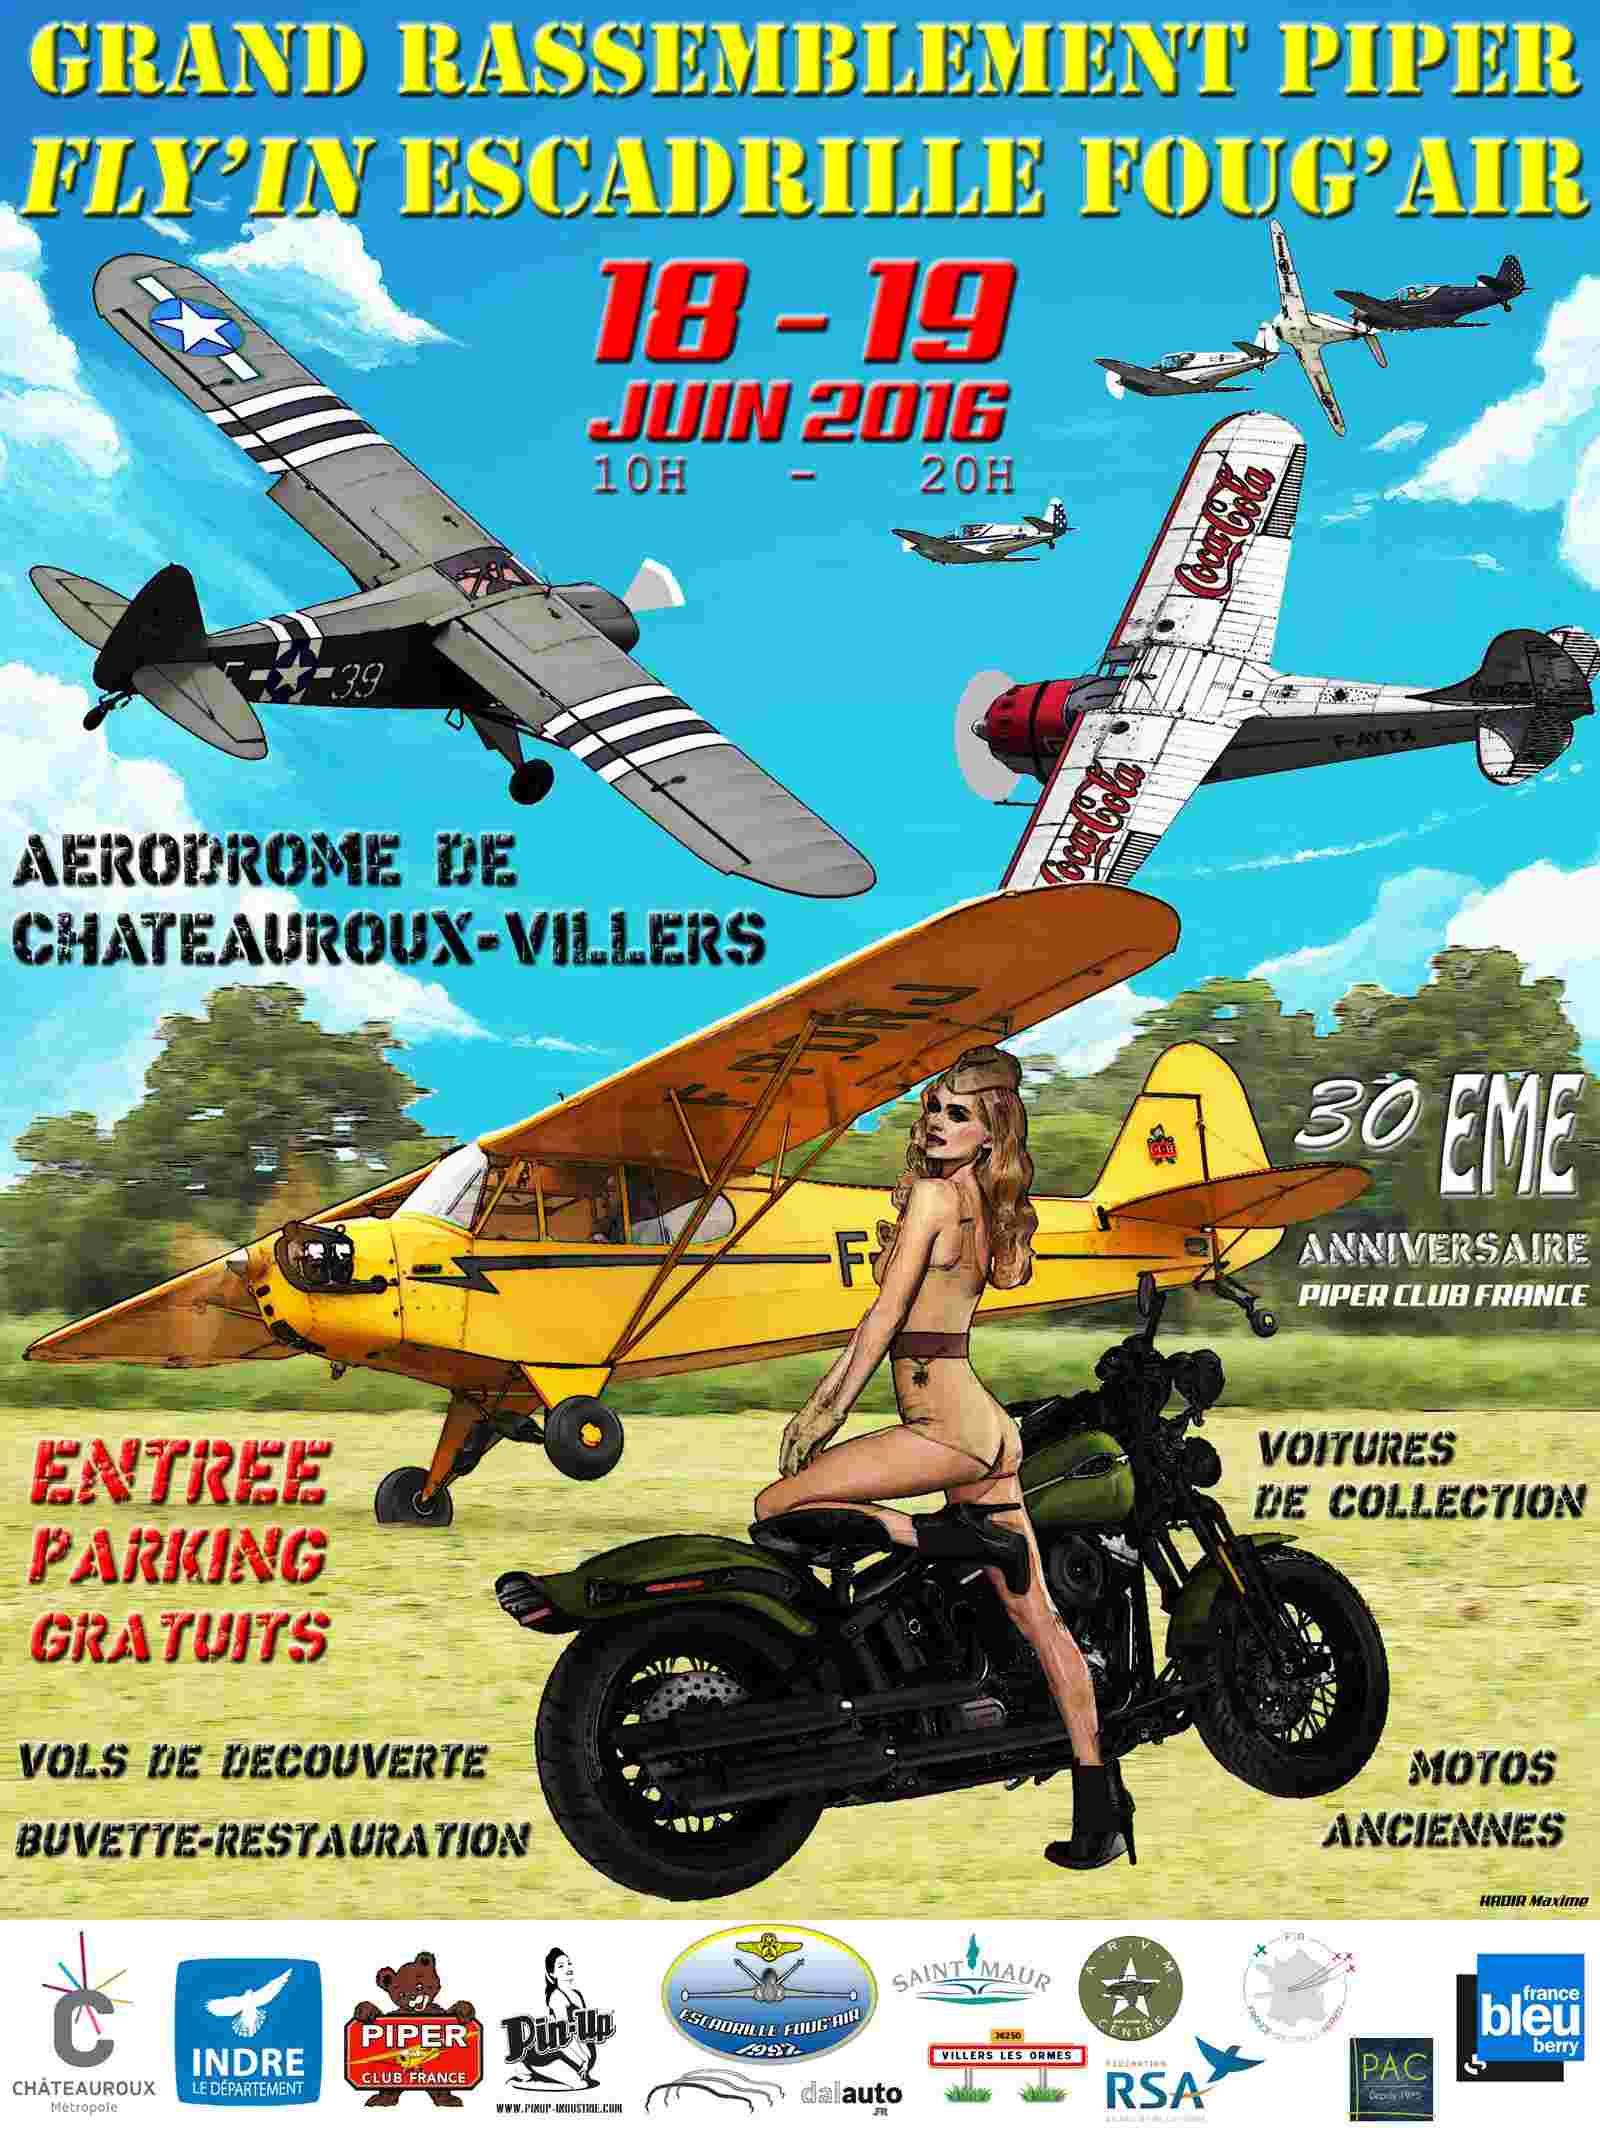 FLY-IN Escadrille Foug'Air 2016, 18-19 Juin Fête Aérienne Légend'Air,fly in 2016 ,Aerodrome de Chateauroux, Meeting Aerien 2016,Airshow 2016, French Airshow 2016